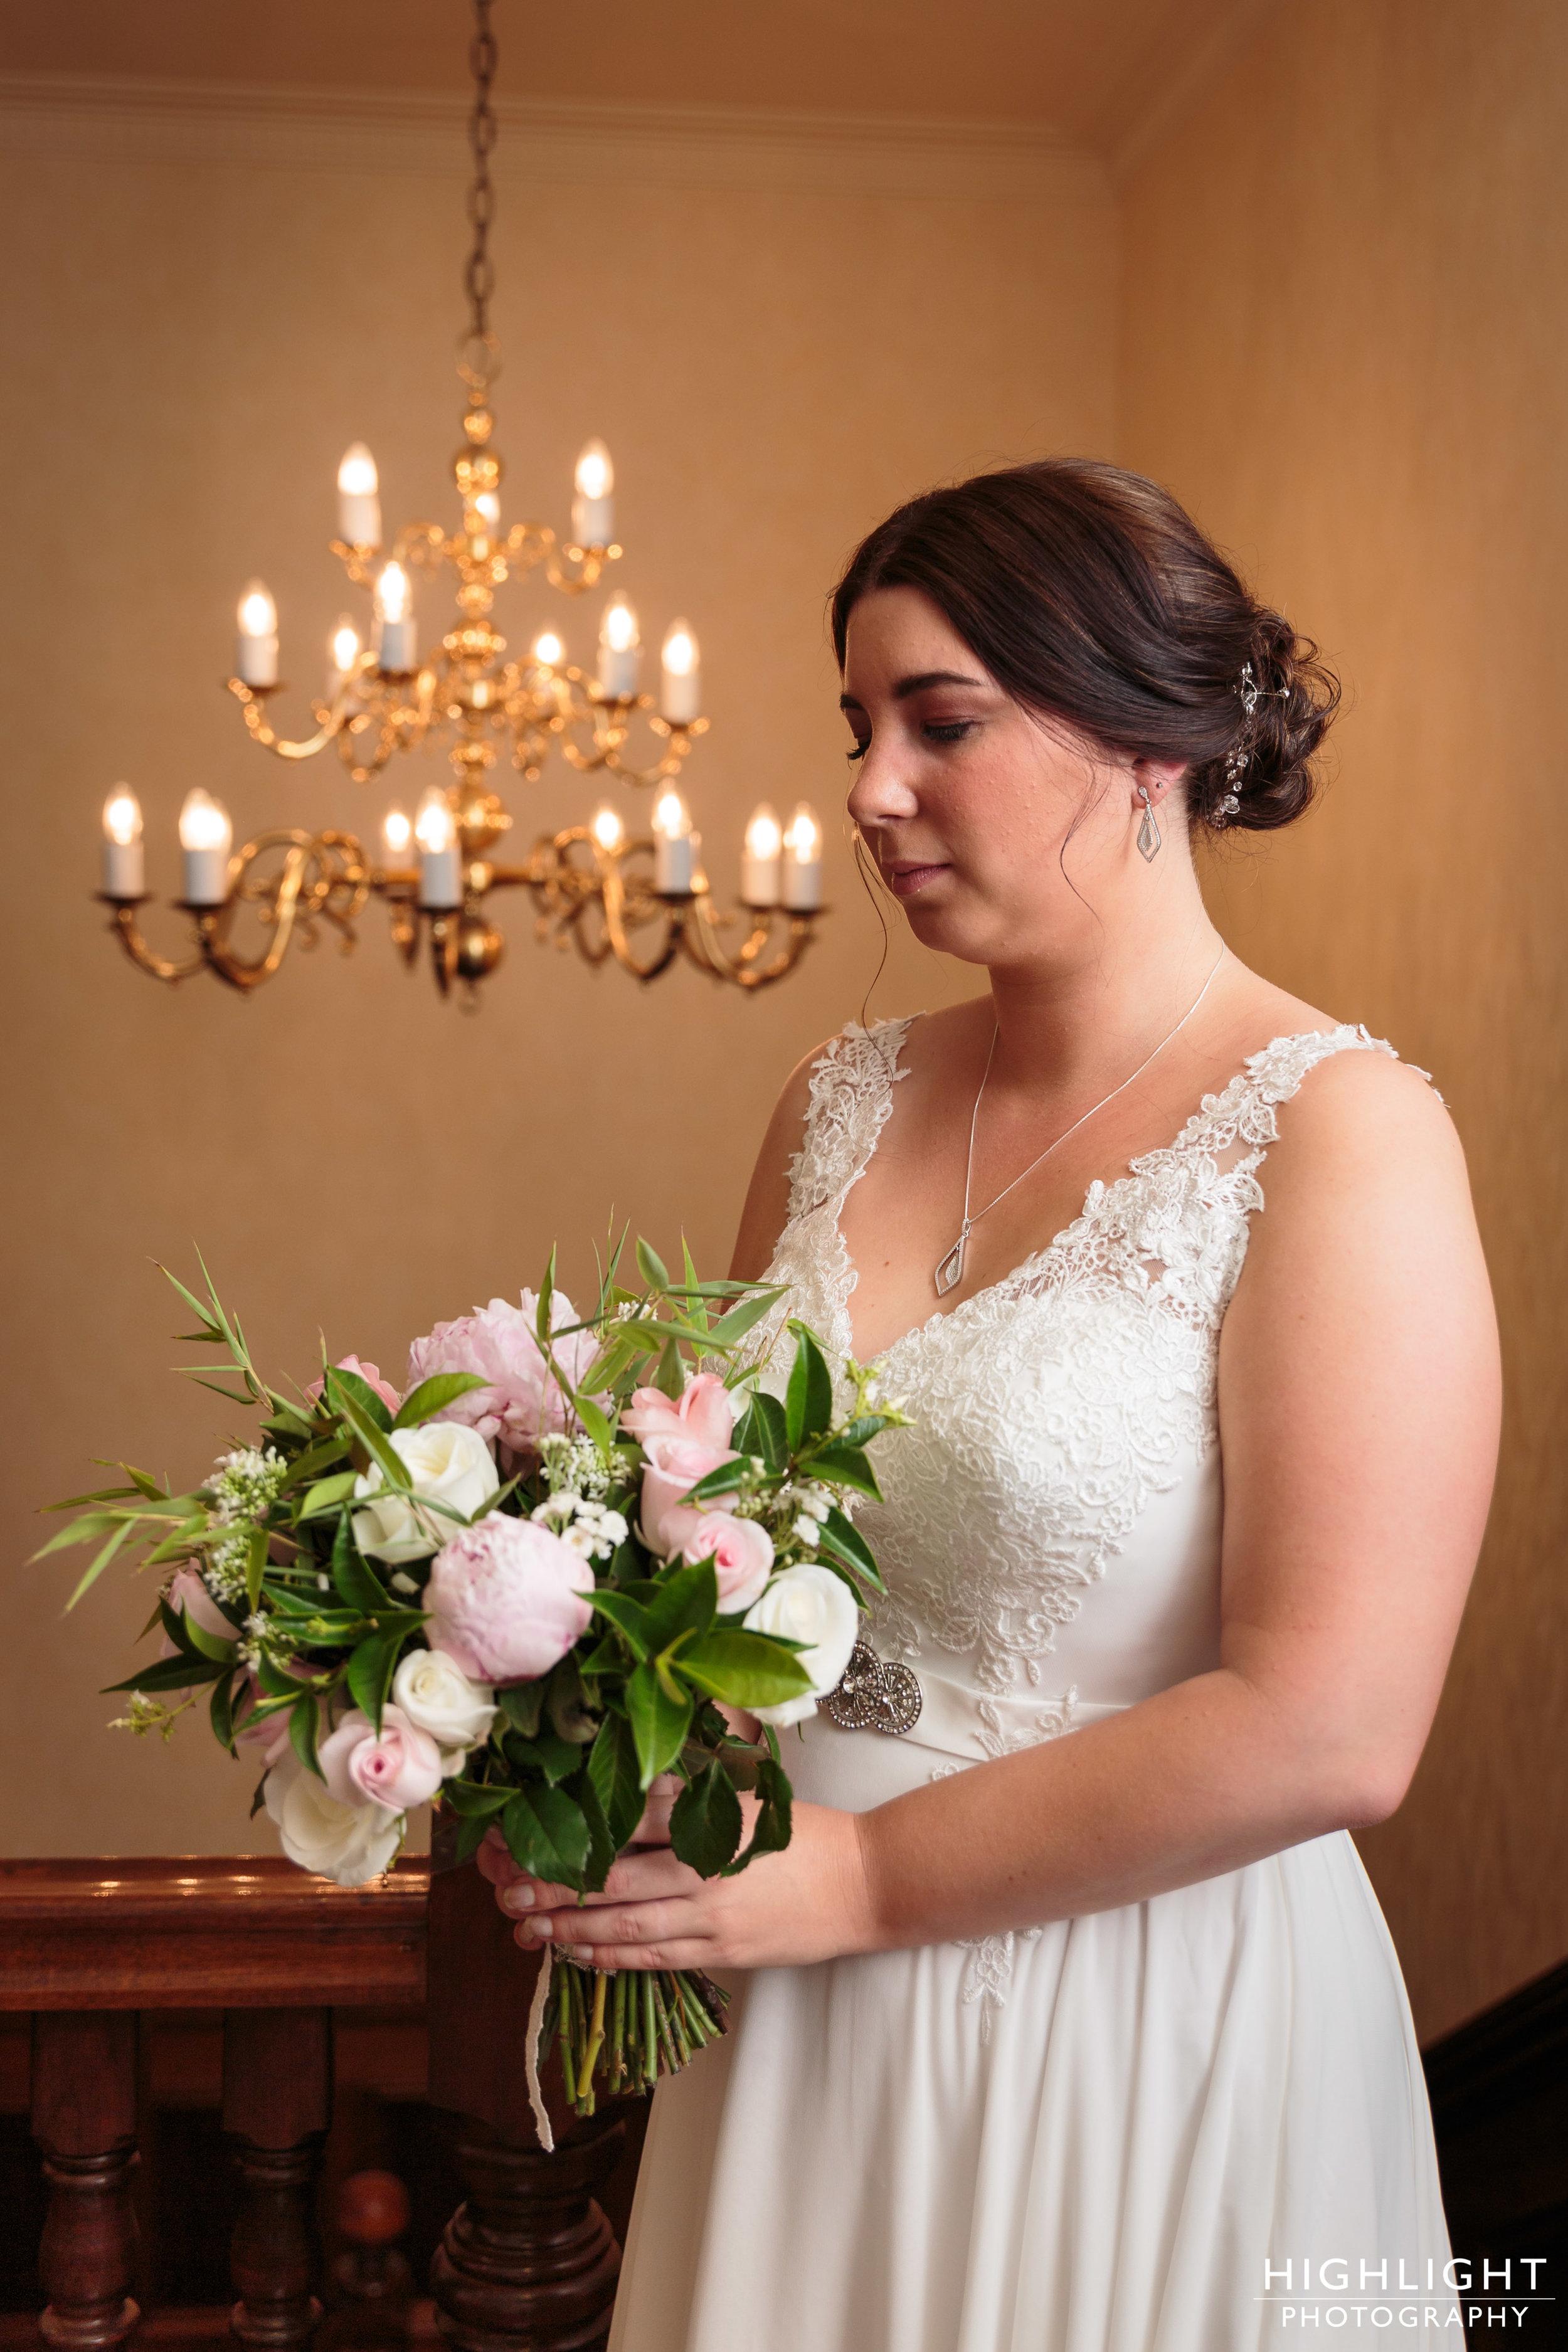 JM-2017-Highlight-wedding-photography-palmerston-north-new-zealand-29.jpg